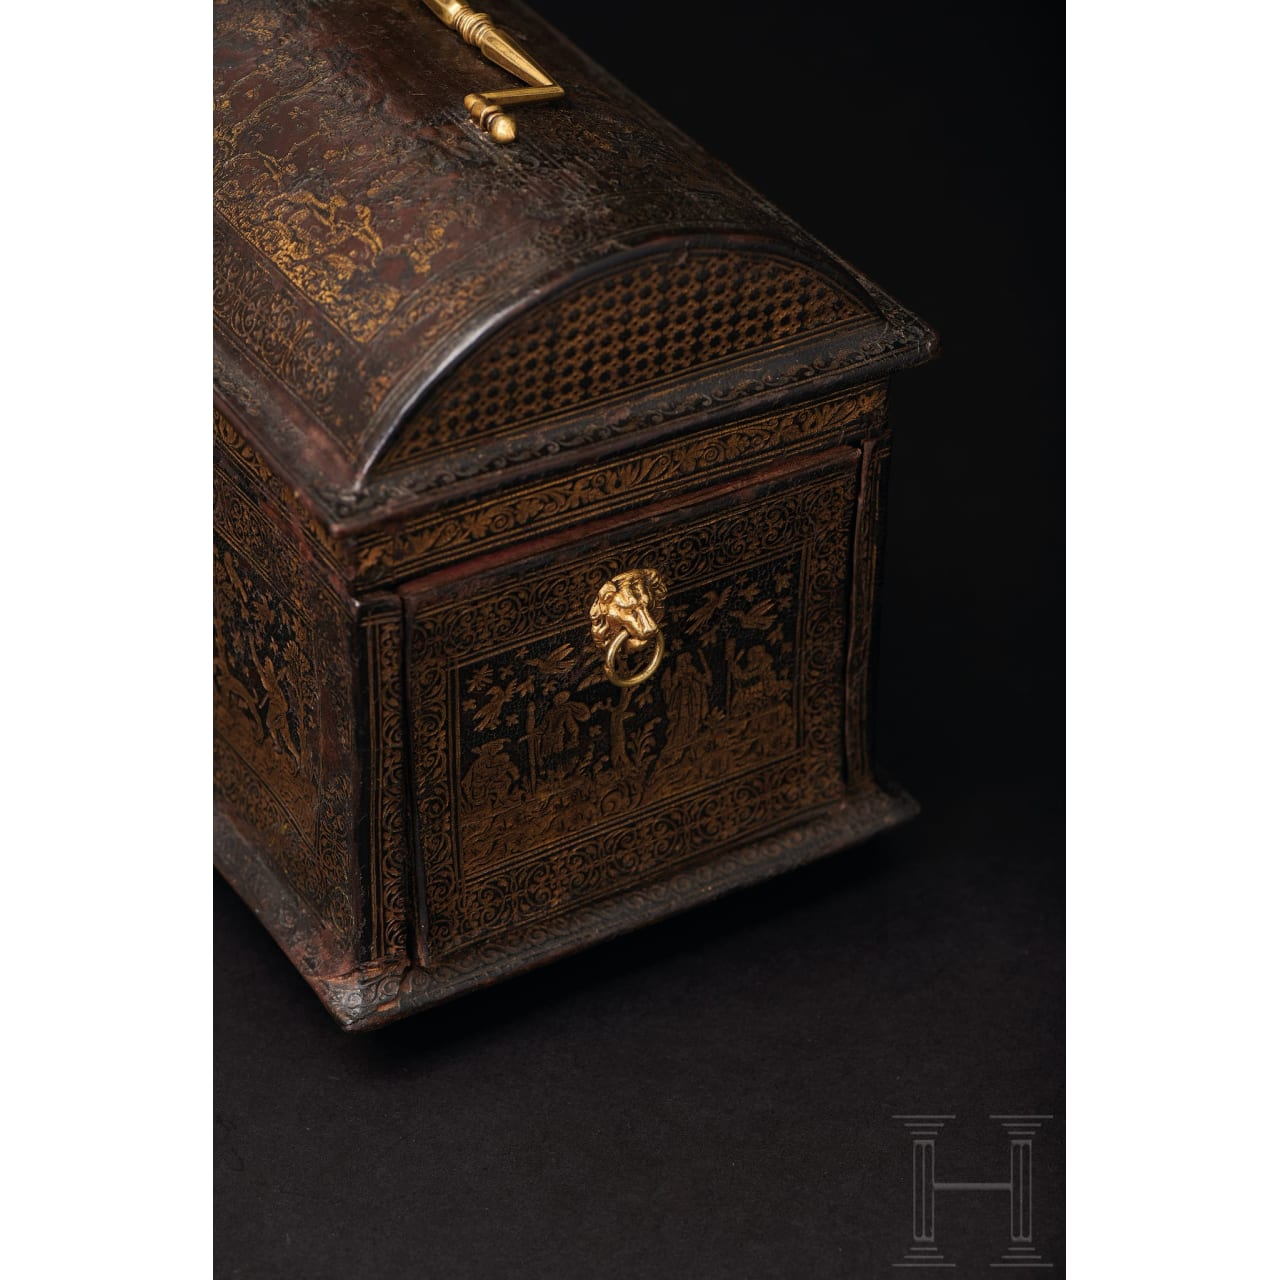 A fine Renaissance wedding casket, Antwerp, late 16th century